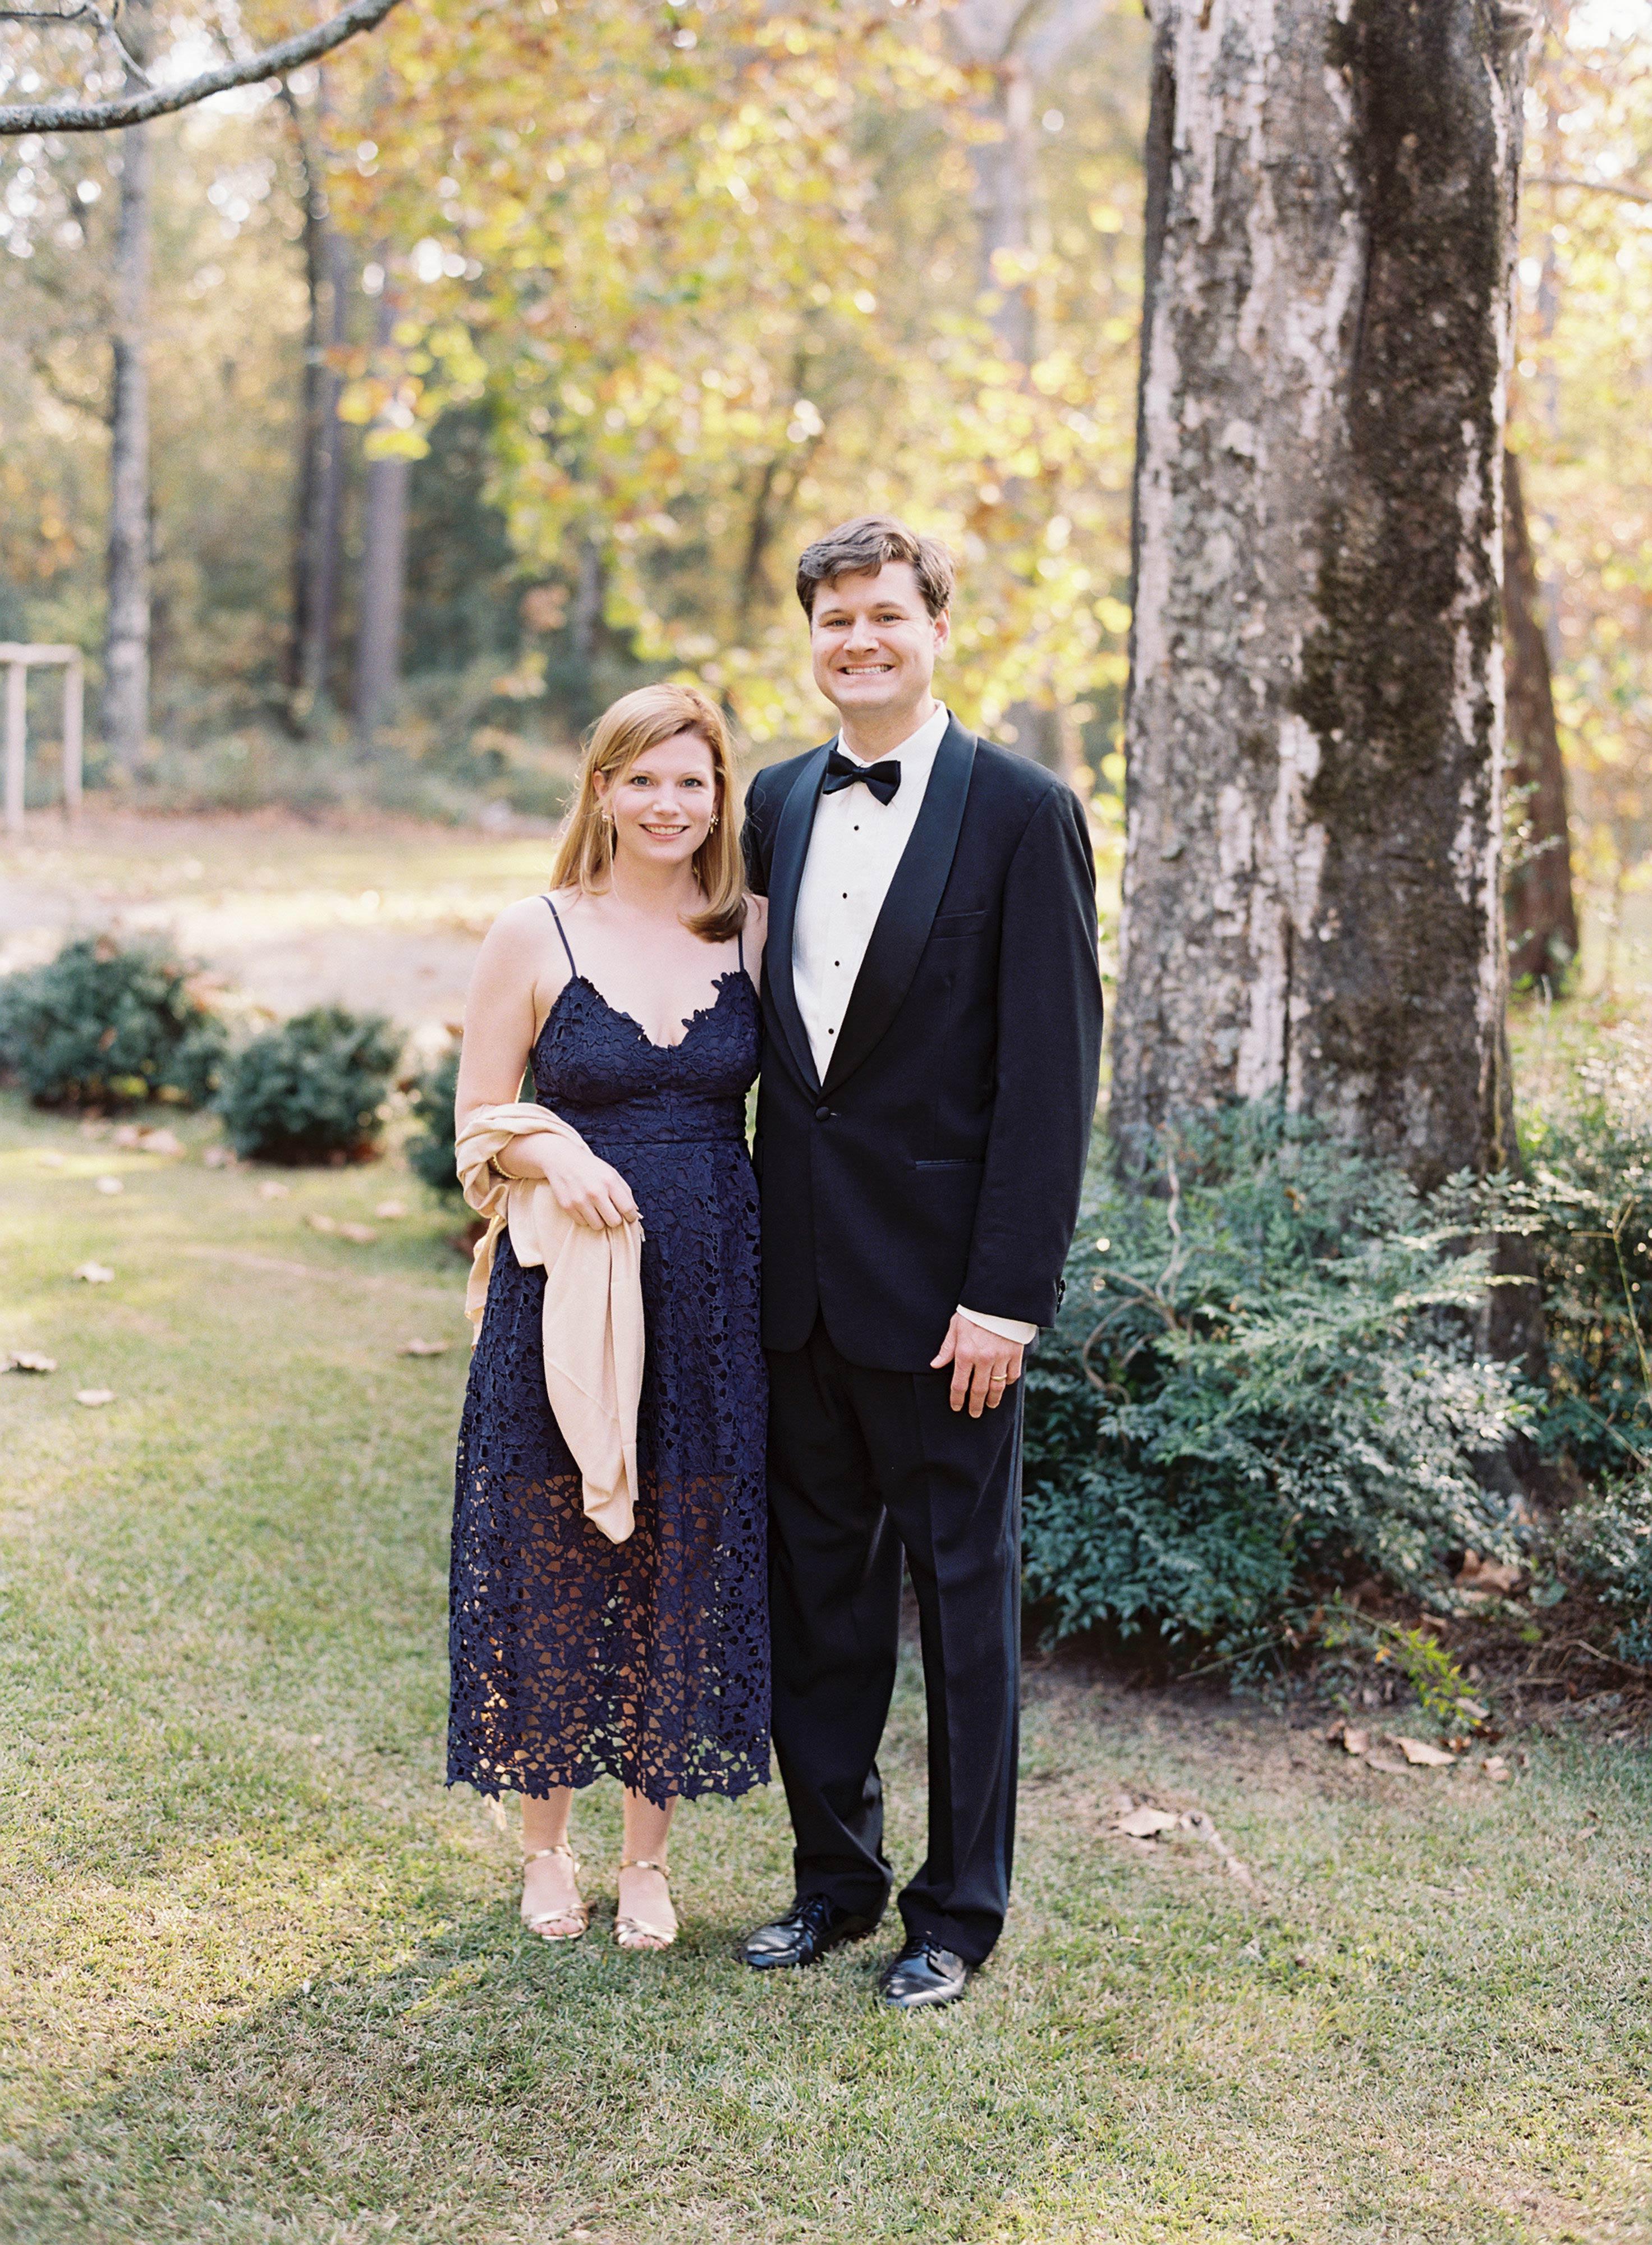 madeline brad wedding guests